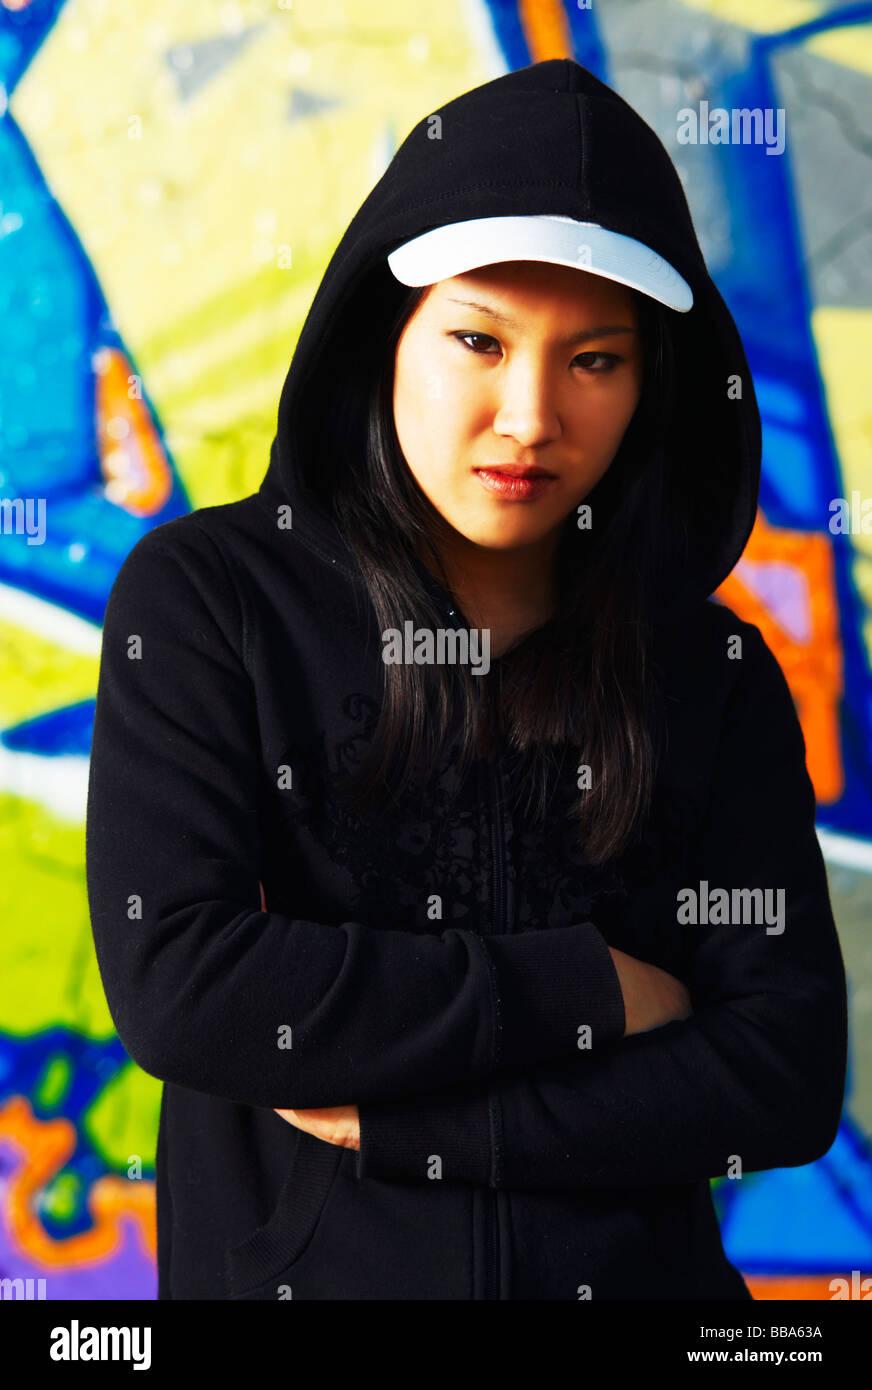 Junge Asiatin in Rapper Pose vor einer Graffitiwand Stockbild